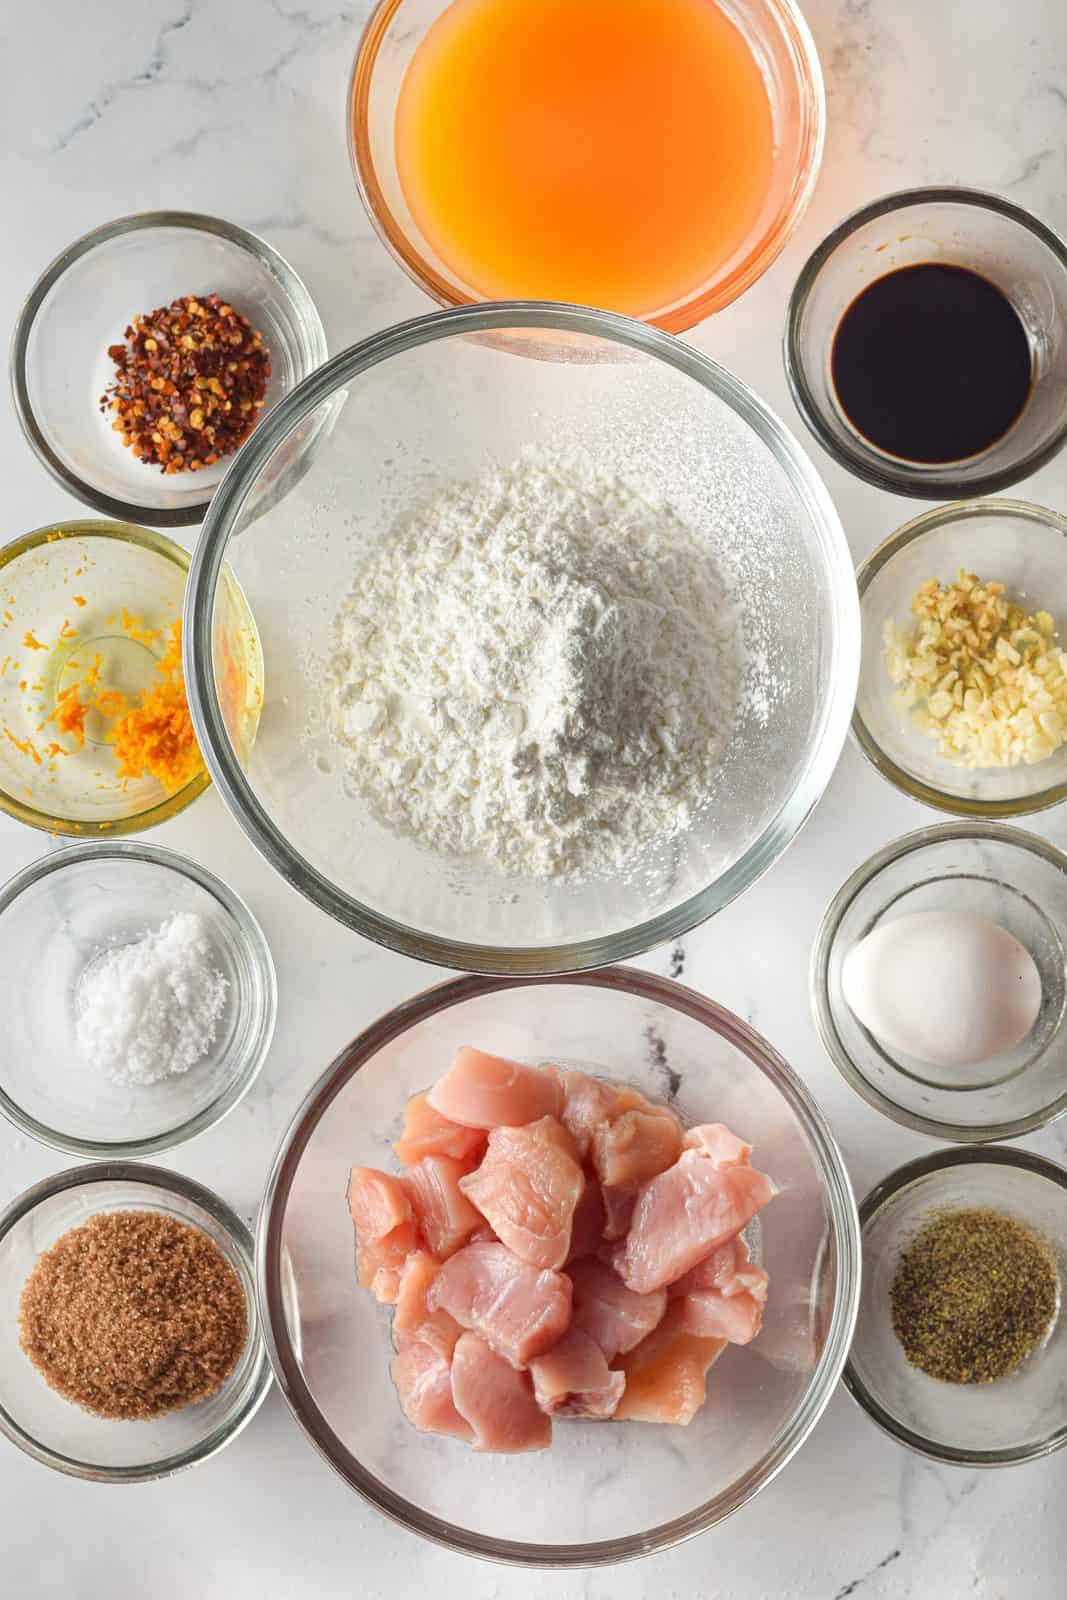 Ingredients needed: chicken breasts, egg, salt, black pepper, soy sauce, corn flour, orange juice, rice vinegar, soy sauce, ginger, garlic, orange zest, brown sugar, chili flakes and water.